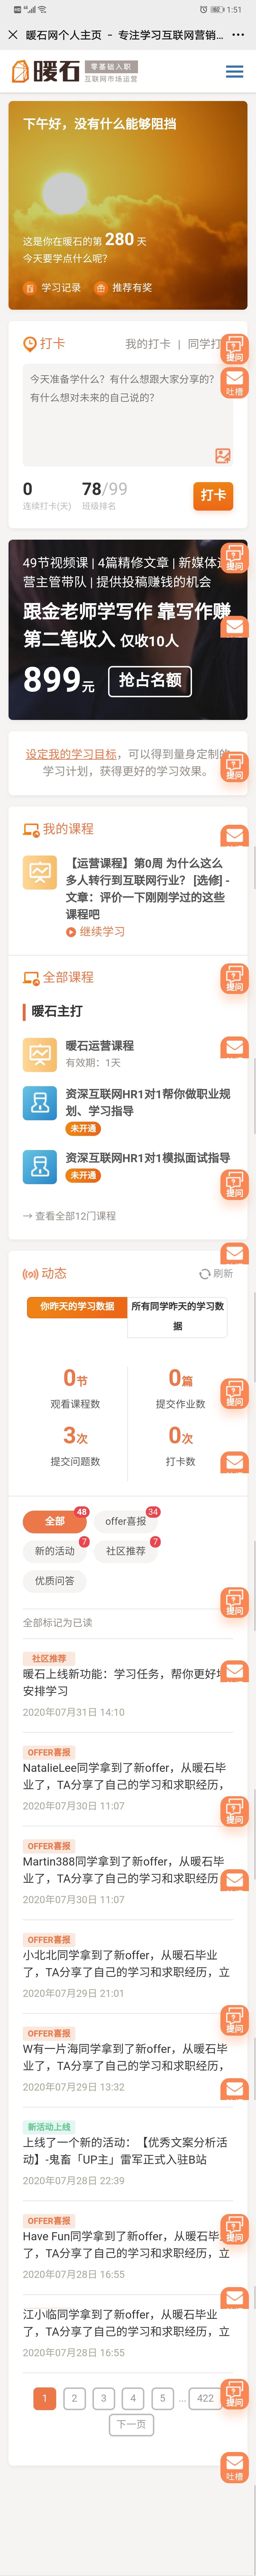 Screenshot_20200802_135141_com.tencent.mm.jpg